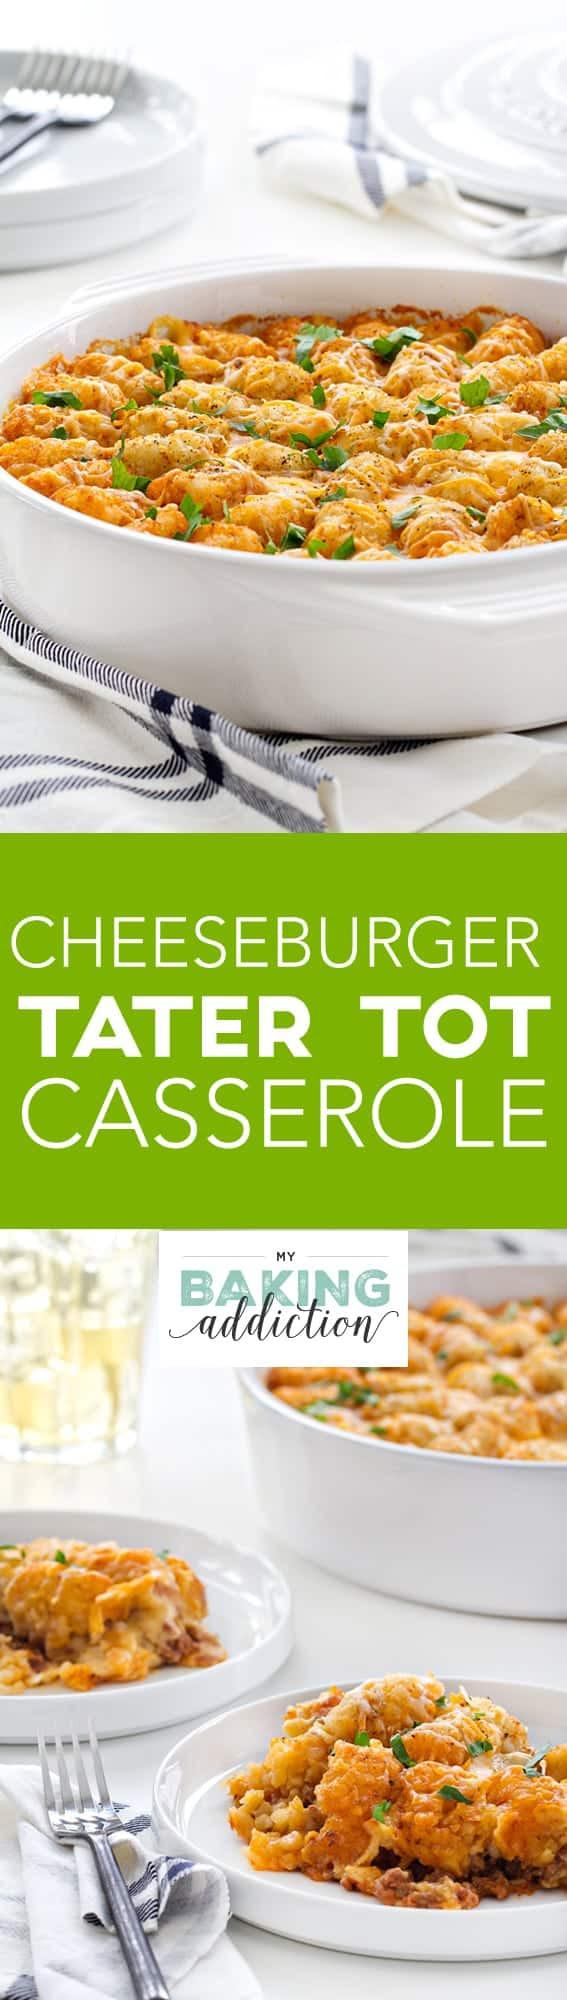 Cheeseburger Tater Tot Casserole - My Baking Addiction